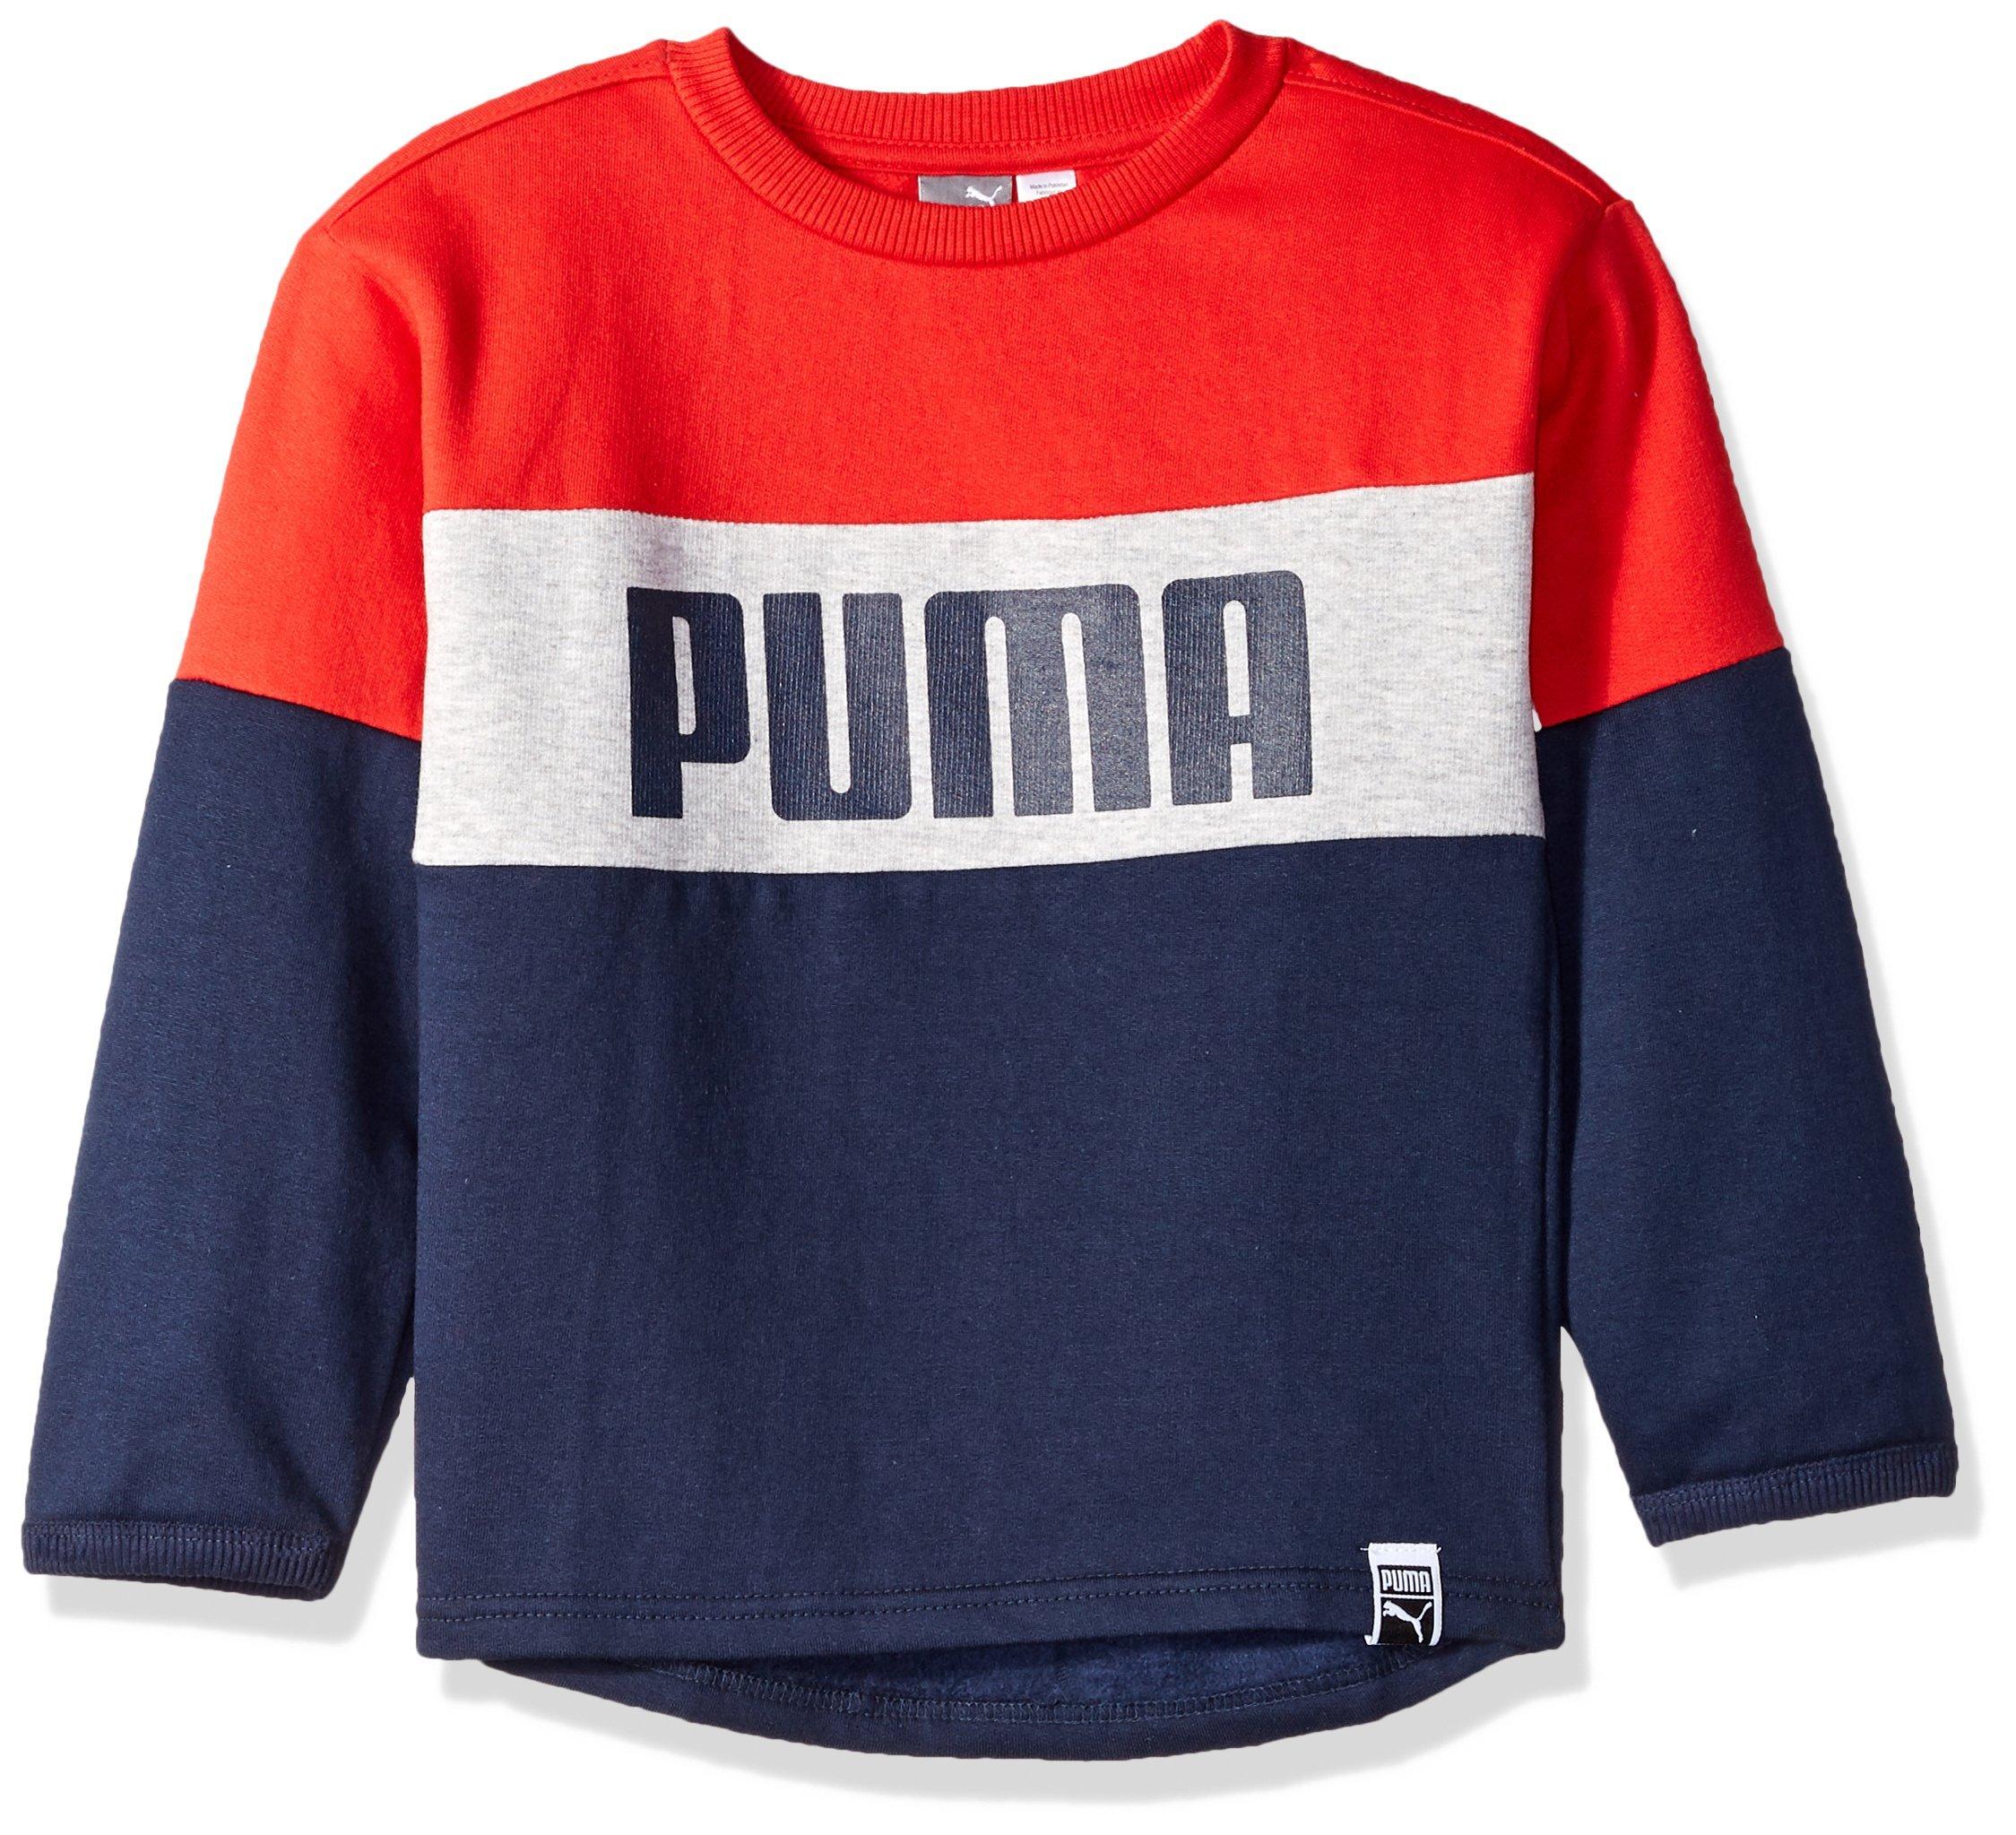 PUMA Little Boys' Fleece Sweatshirt, Peacoat, 5